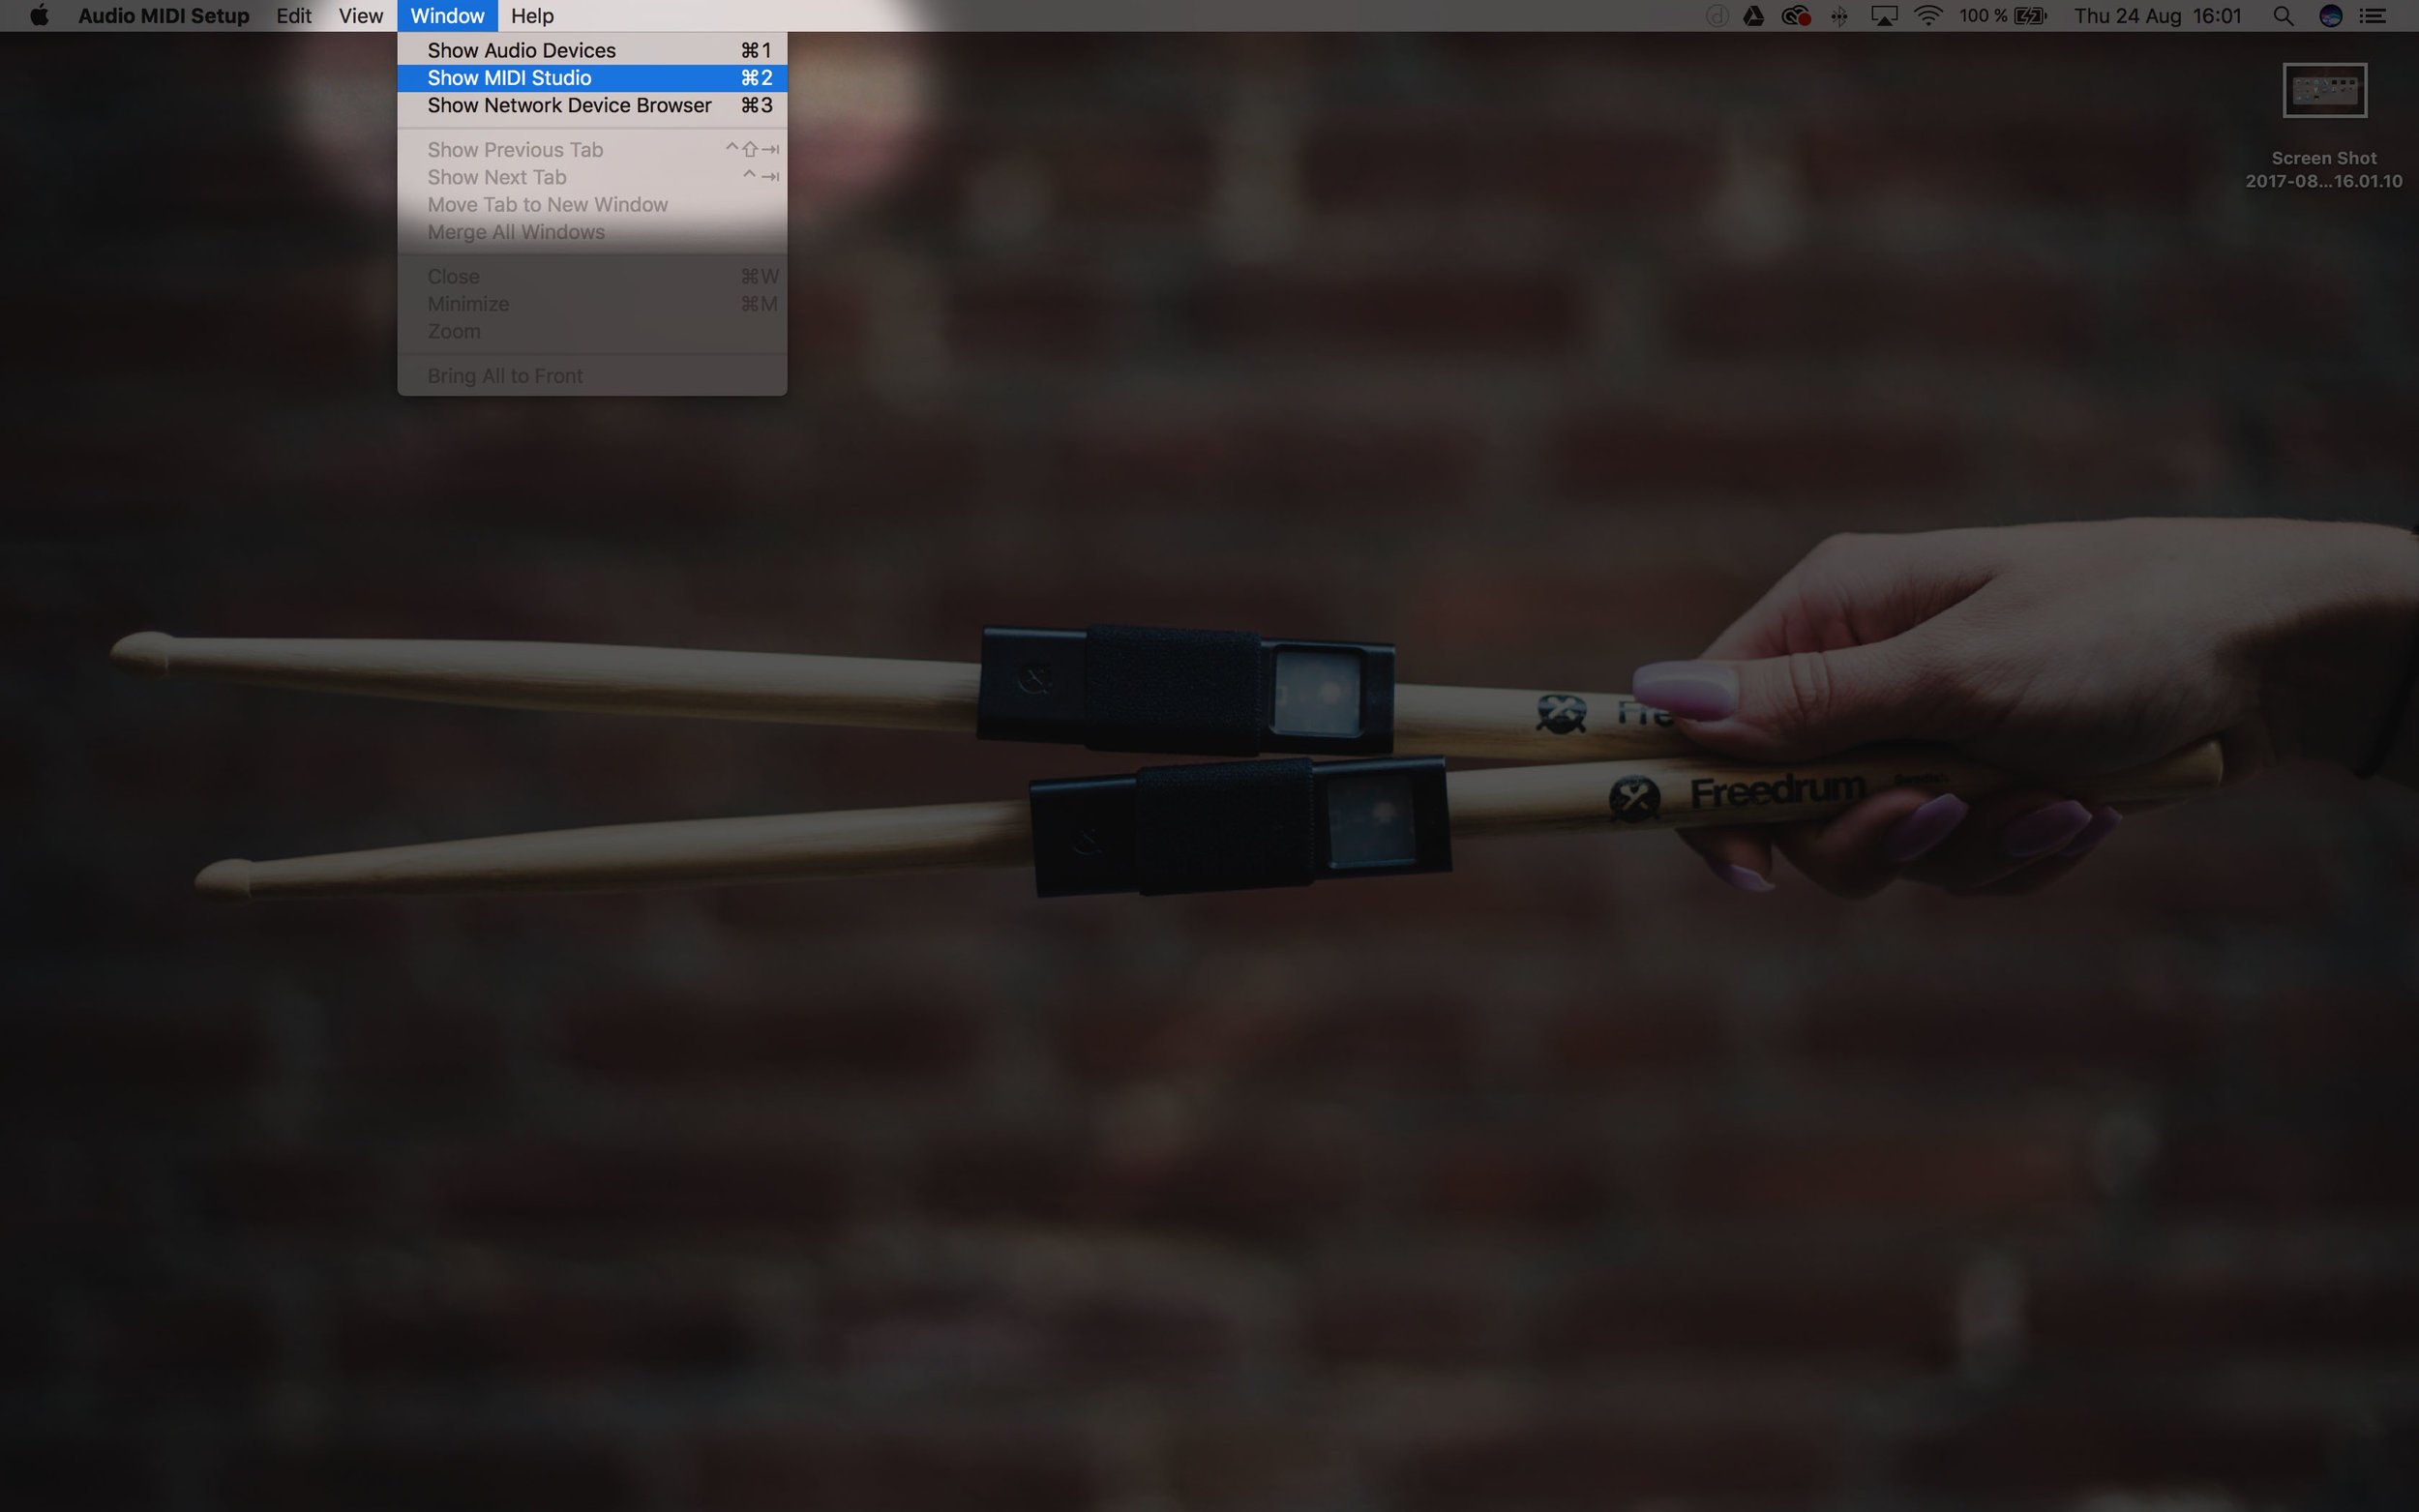 fd_setup_mac-showmidistudio.jpg